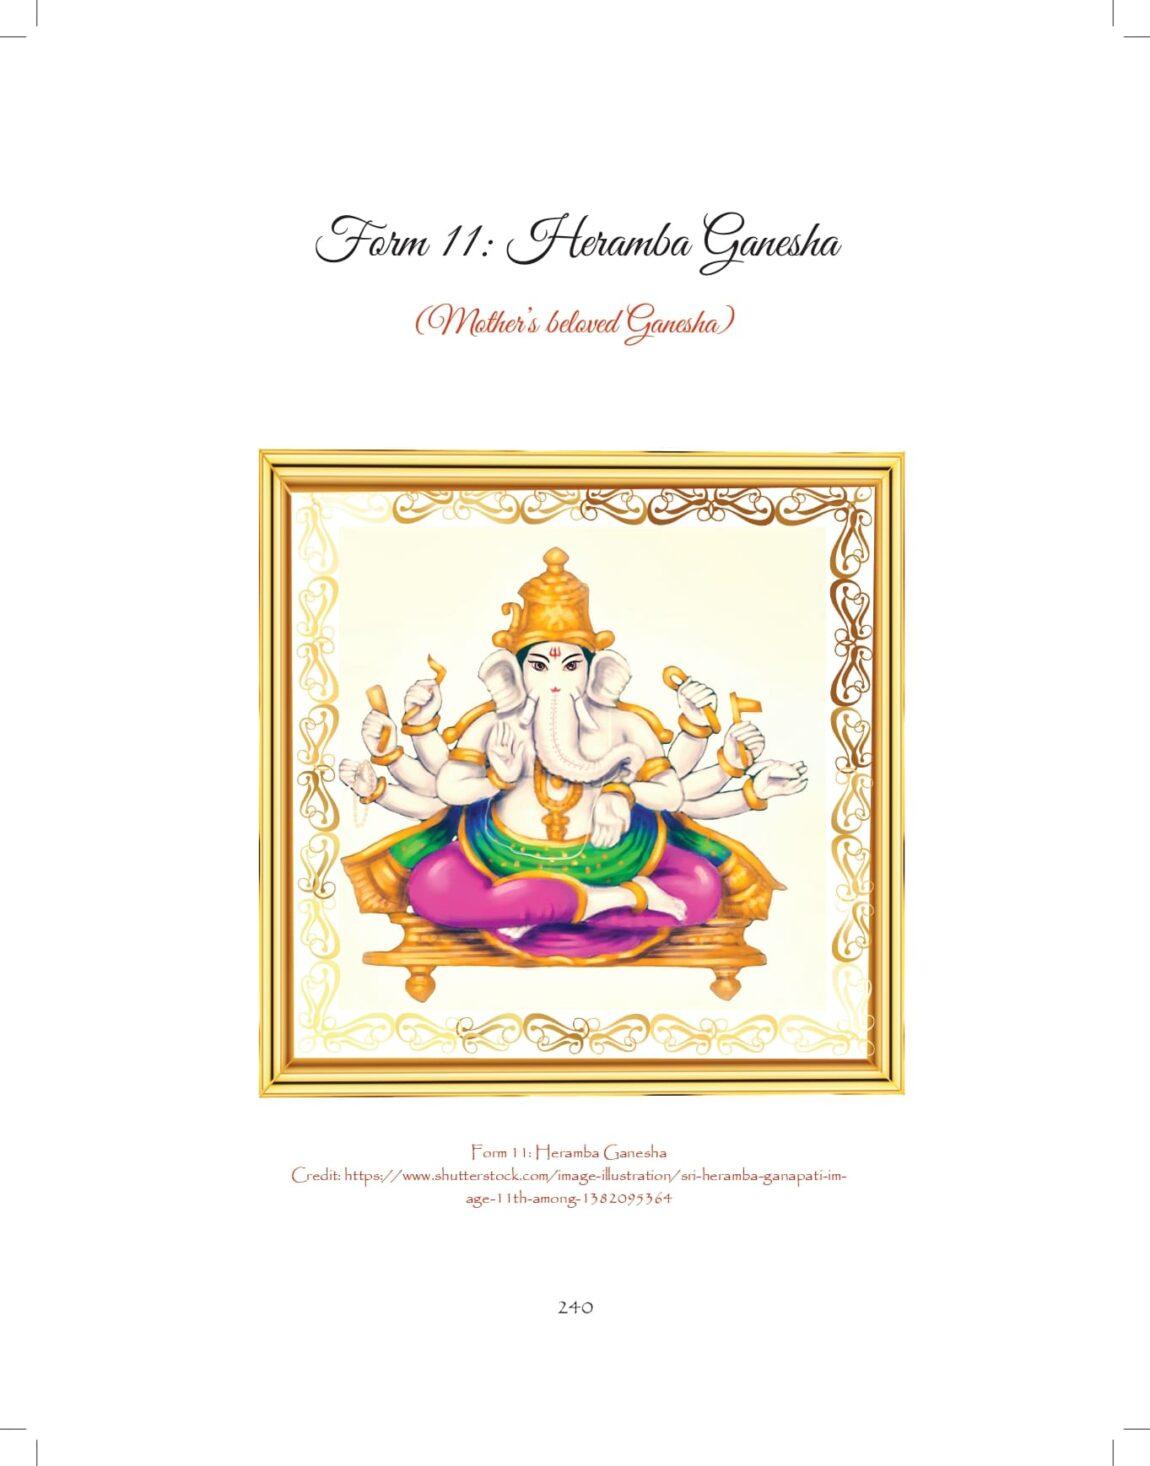 Ganesh-print_pages-to-jpg-0240.jpg